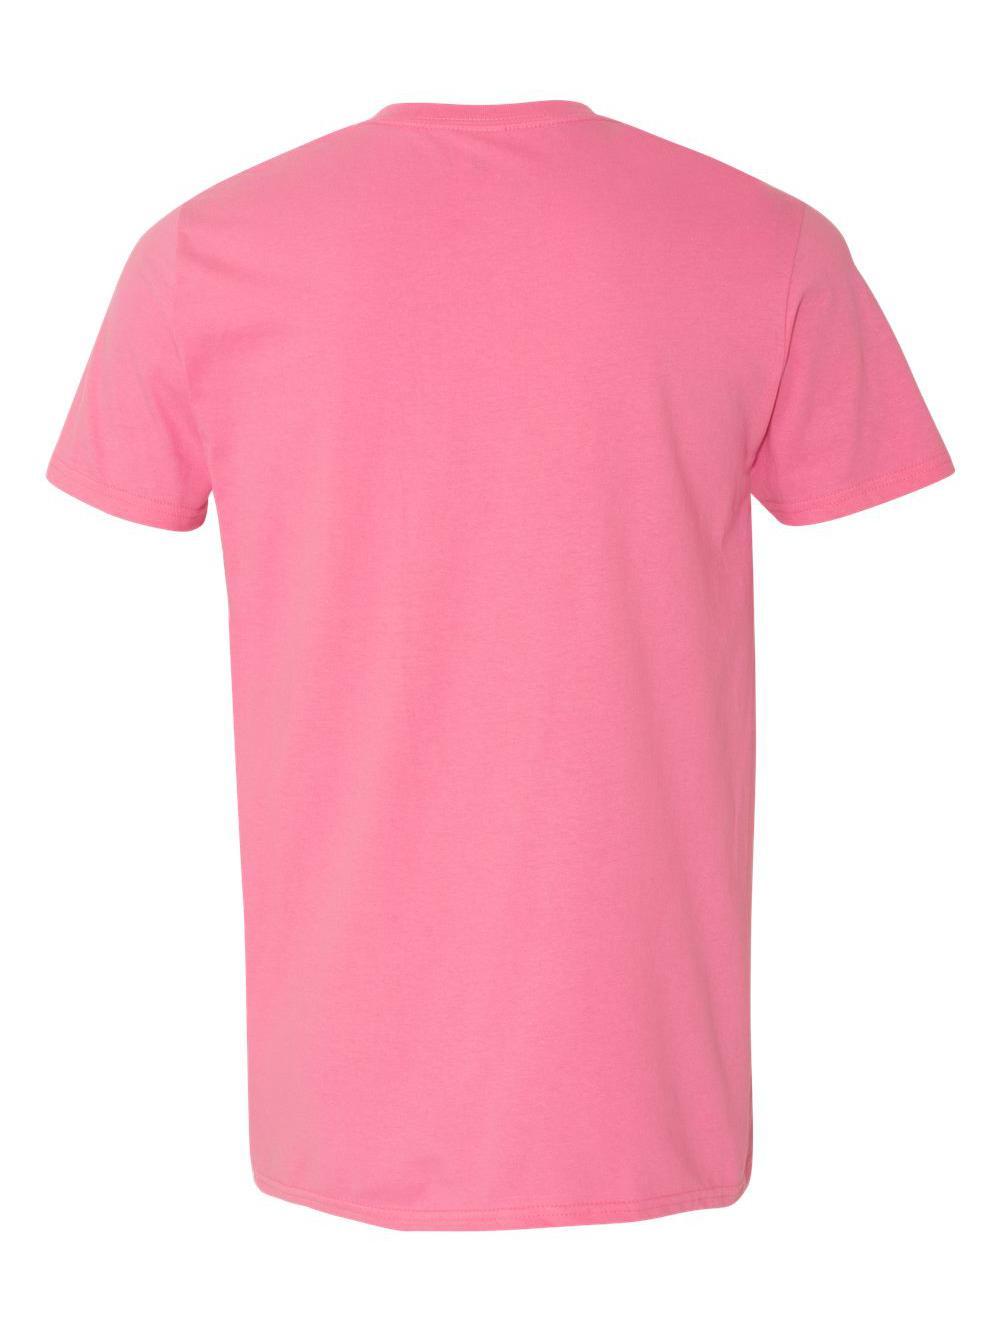 Gildan-Softstyle-T-Shirt-64000 thumbnail 13